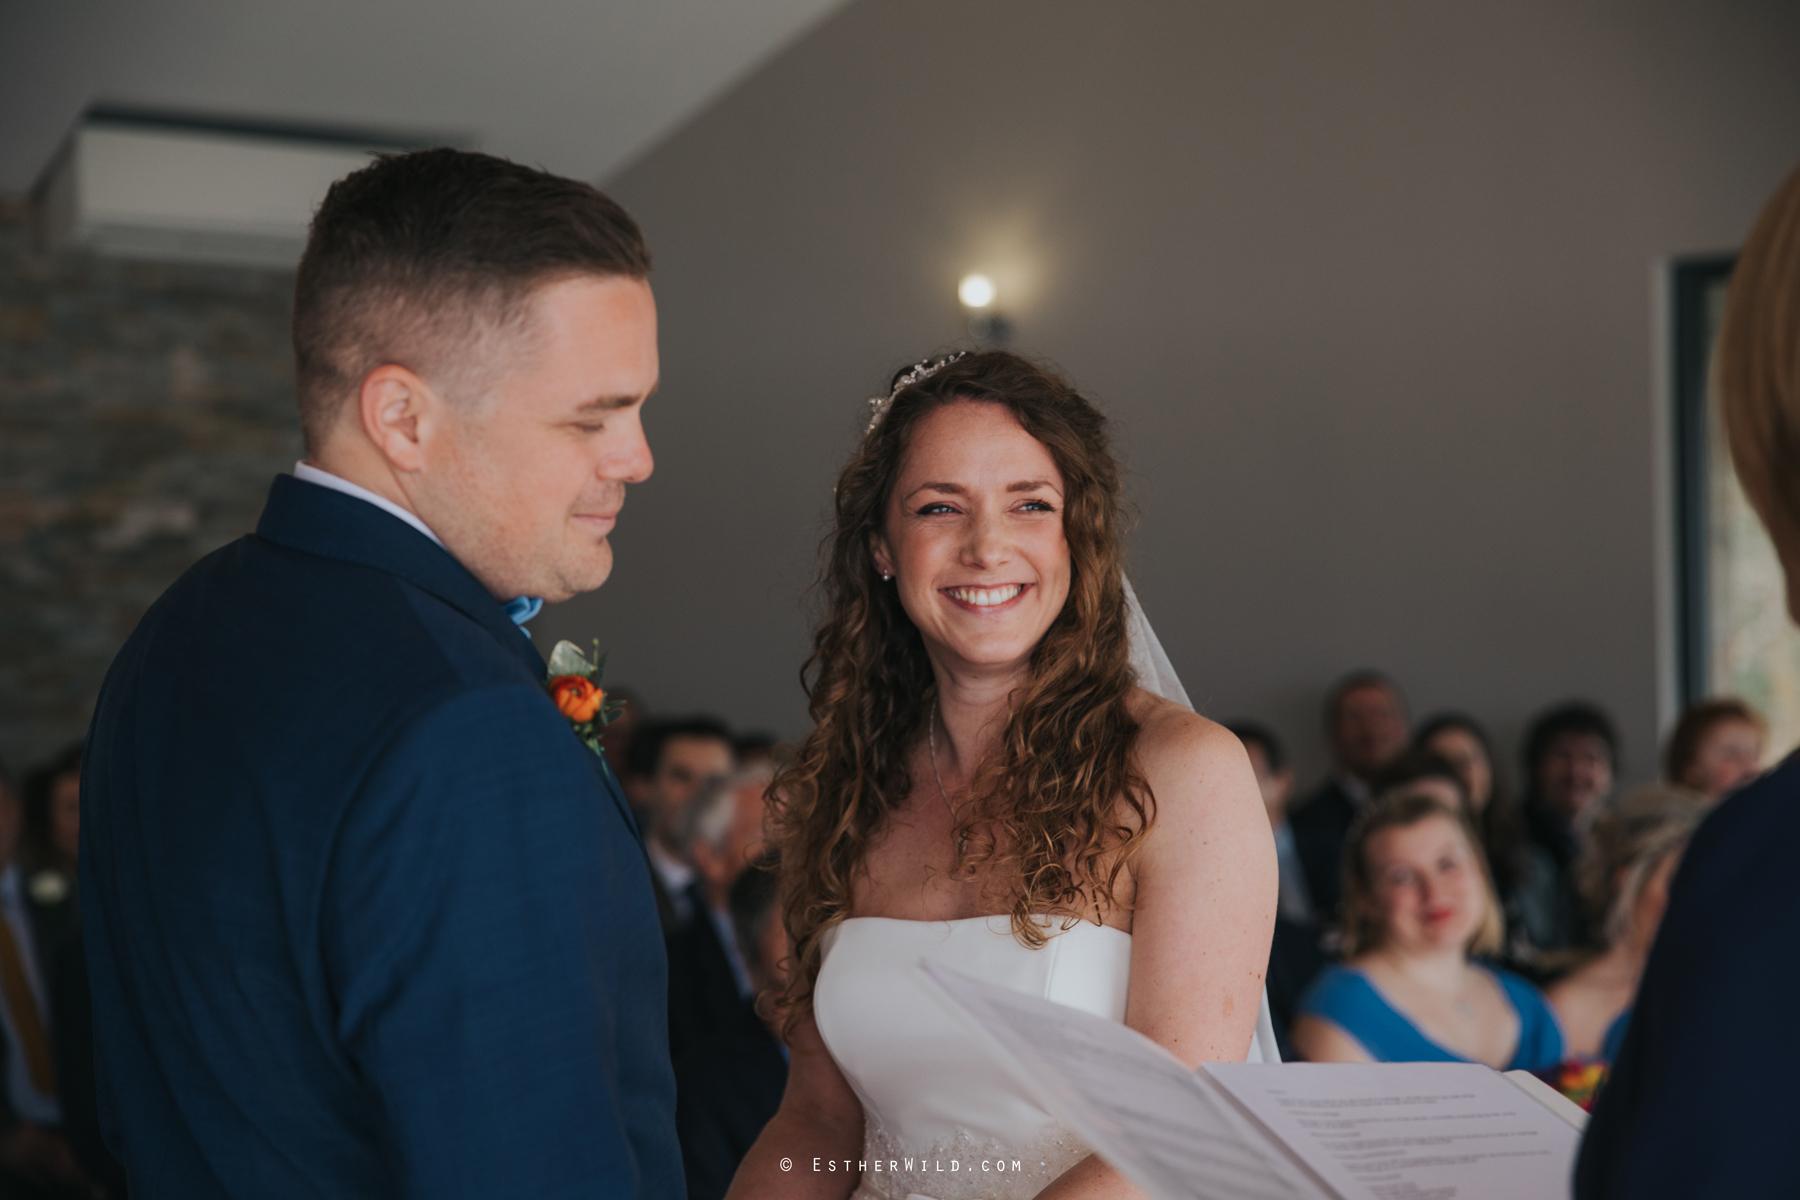 The_BoatHouse_Wedding_Venue_Ormesby_Norfolk_Broads_Boat_Wedding_Photography_Esther_Wild_Photographer_IMG_1088.jpg